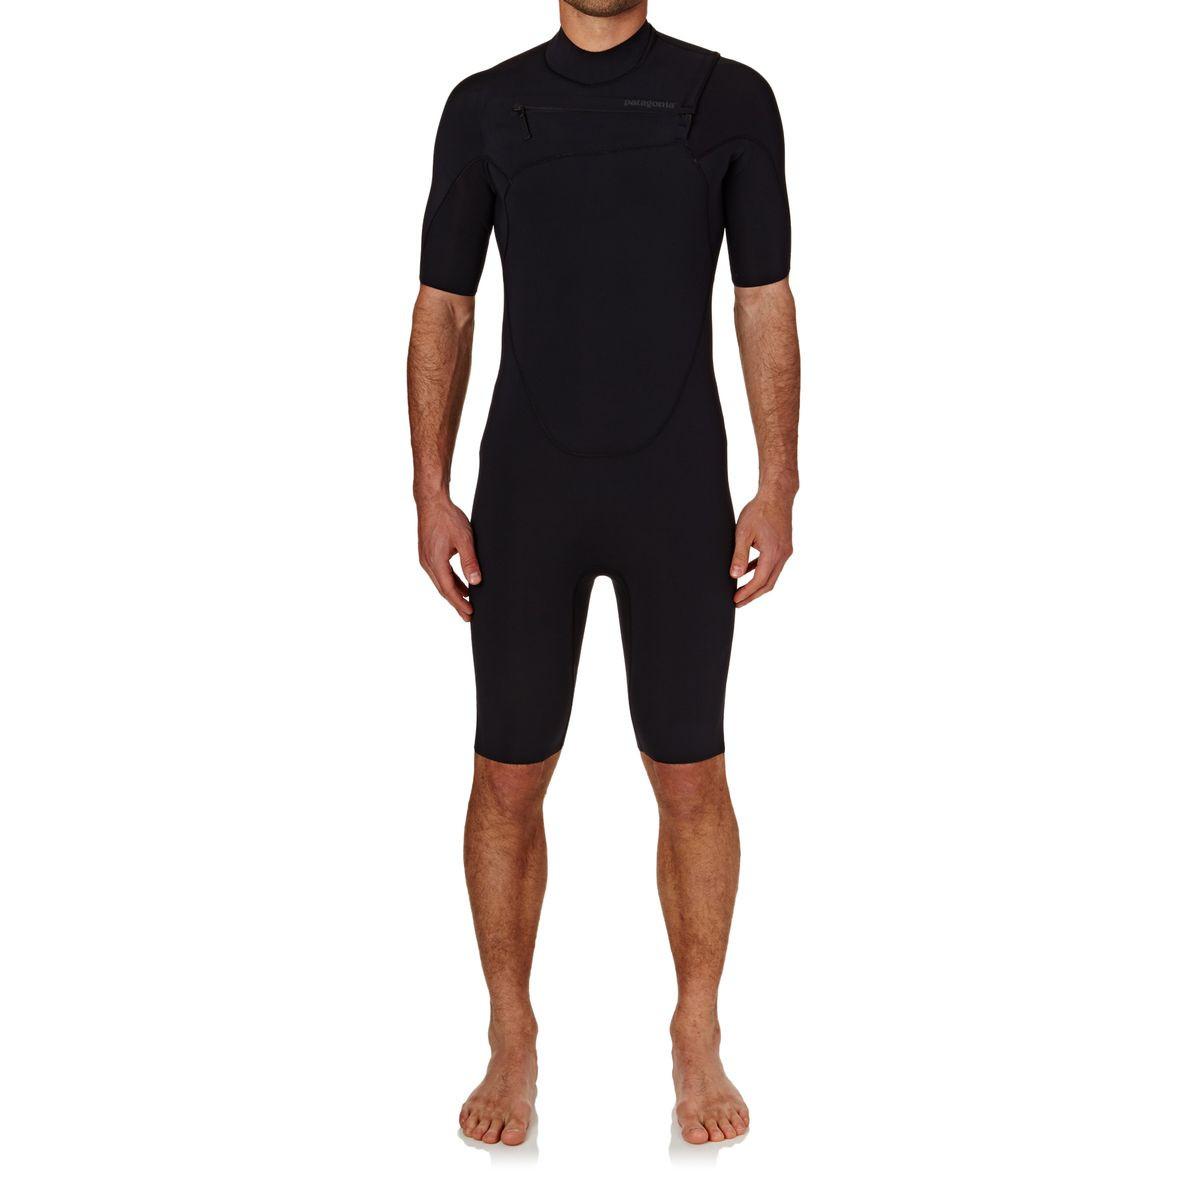 Patagonia R1 Lite Yulex Chest Zip Shorty Wetsuit - Black